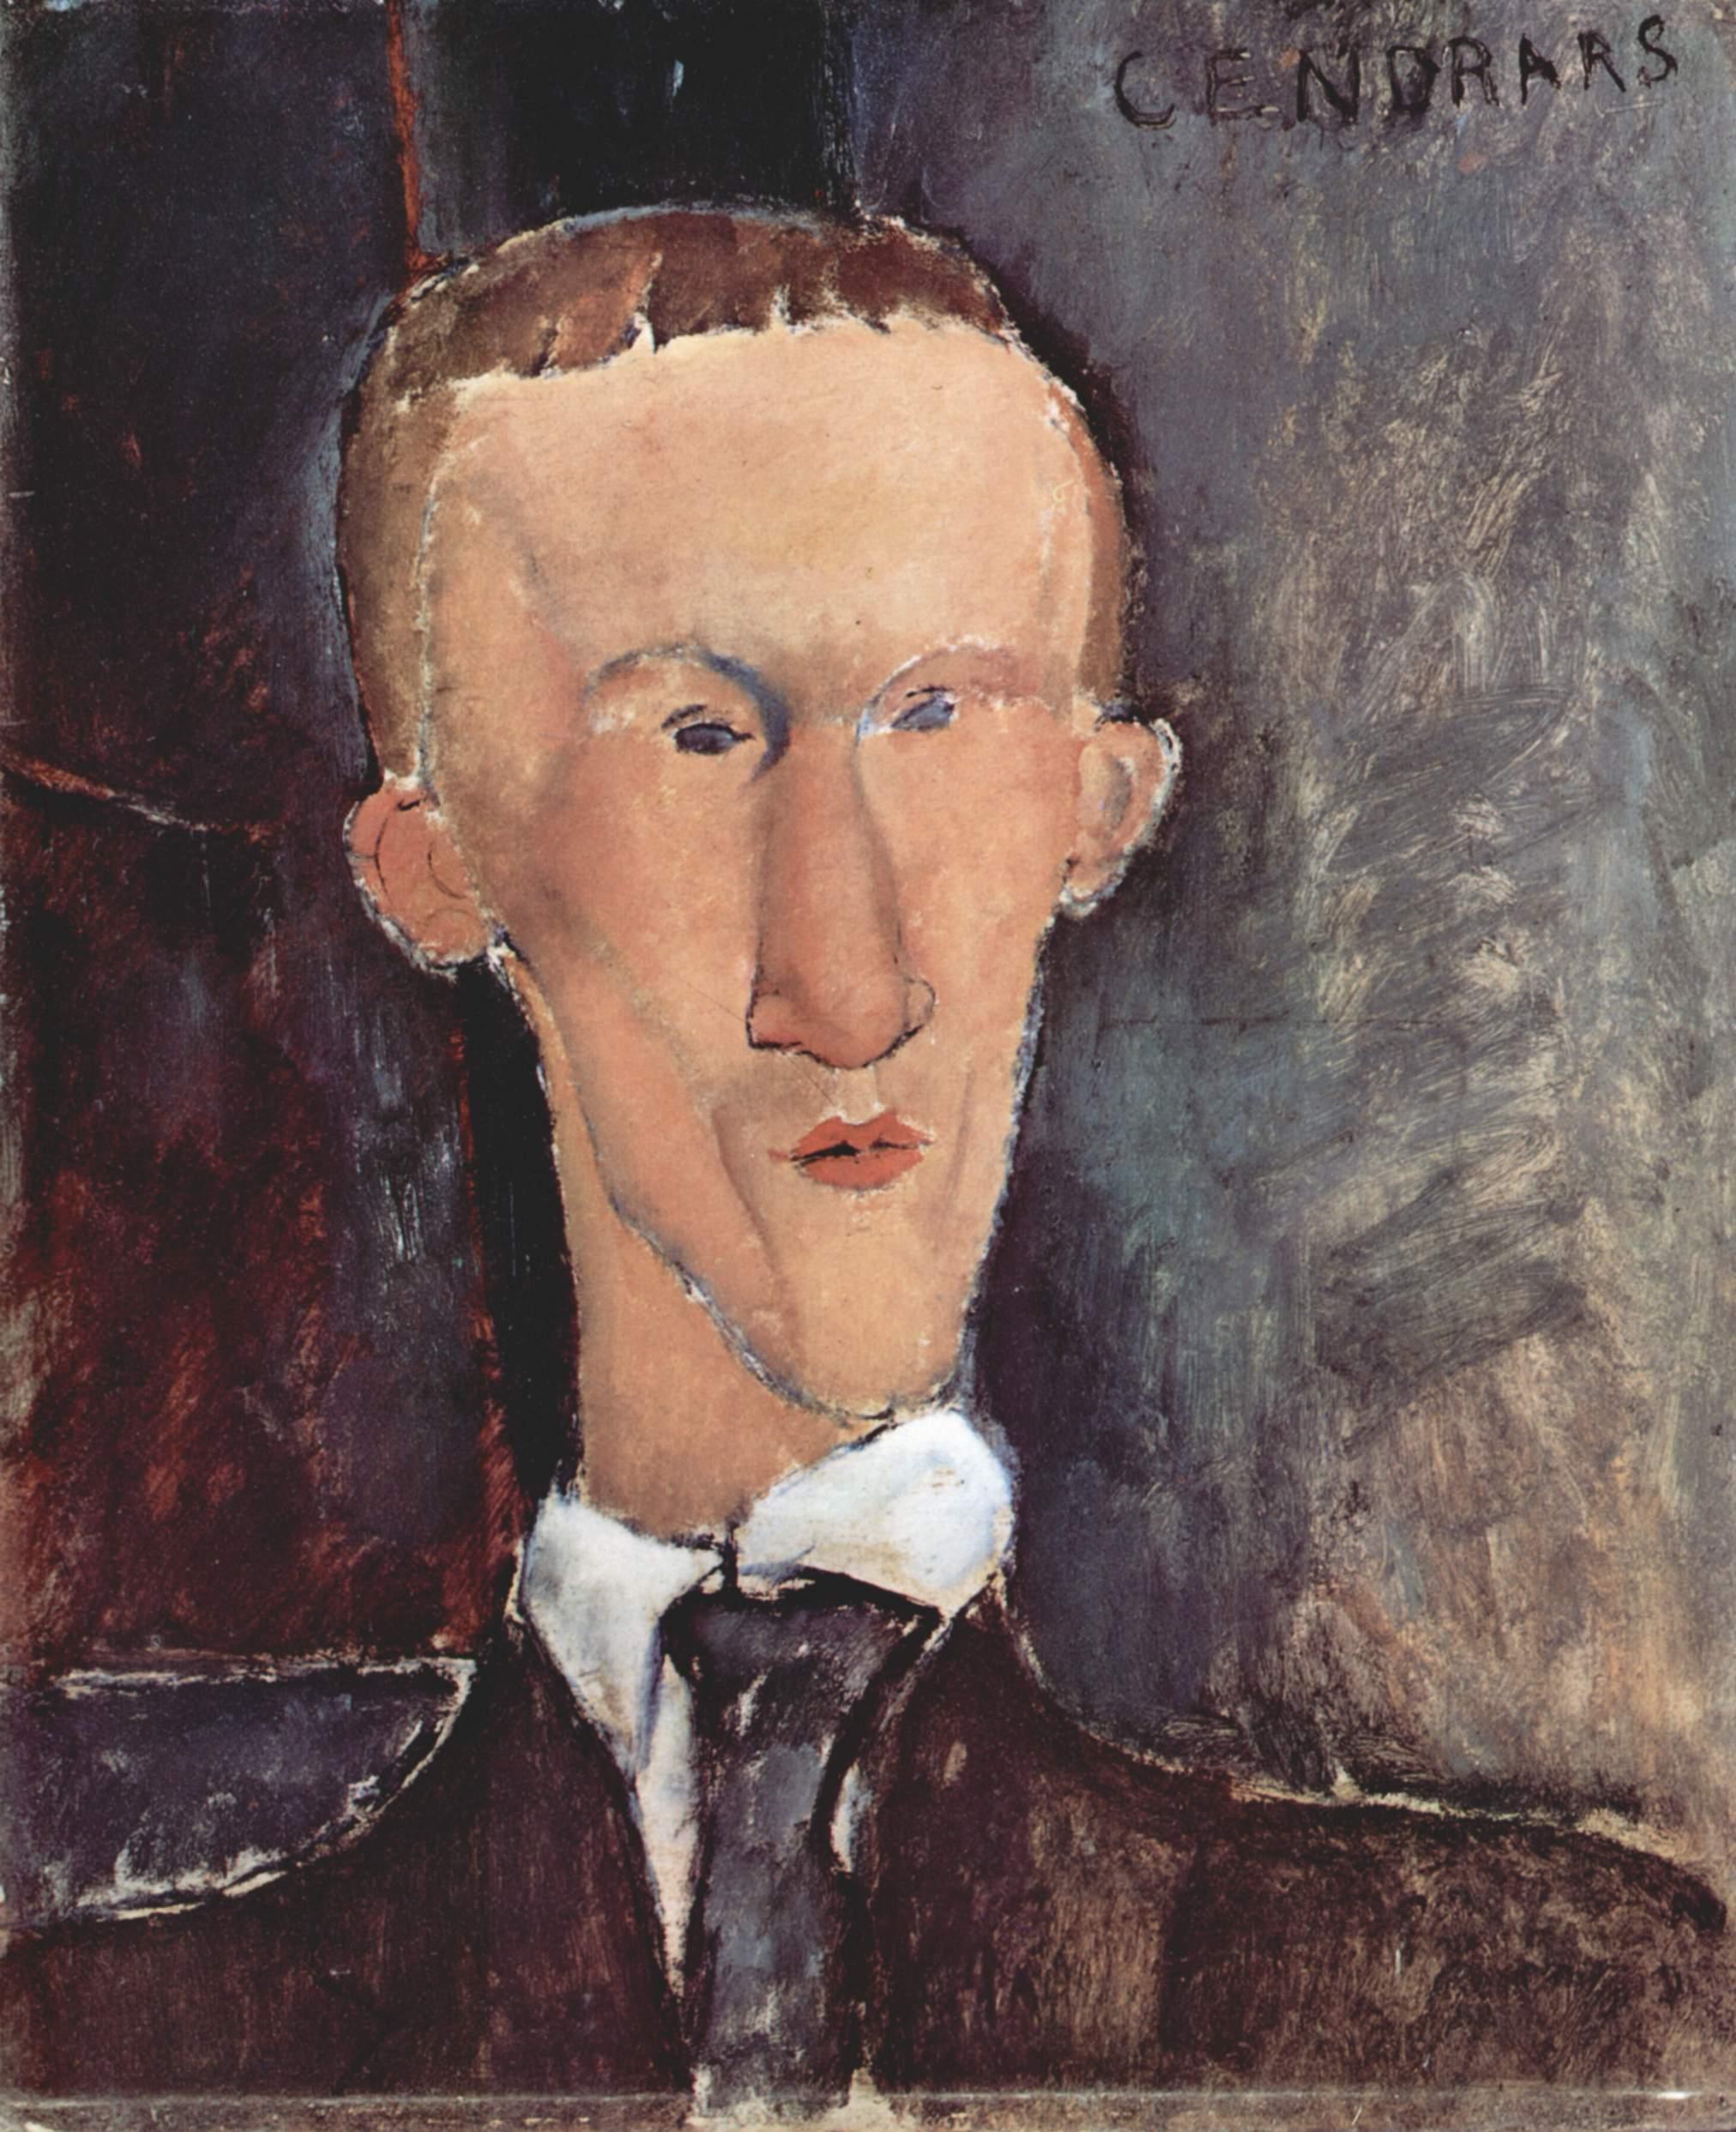 Blaise Cendrars, pintado por Amadeo Modigliani